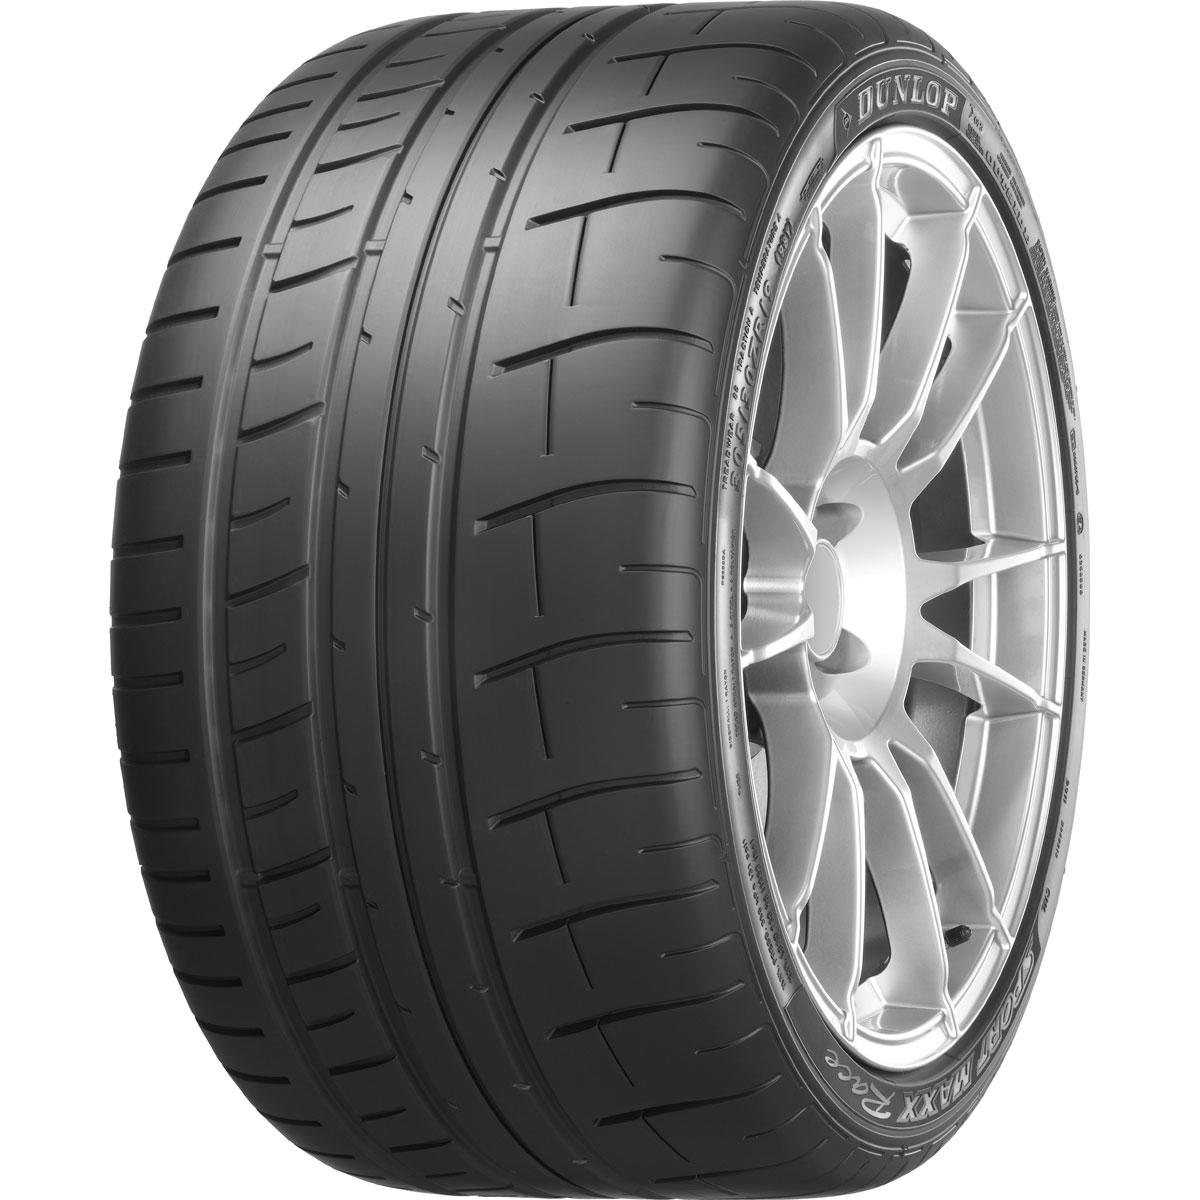 DUNLOP 265/35 ZR19 SportMaxx Race 98Y MO XL MFS